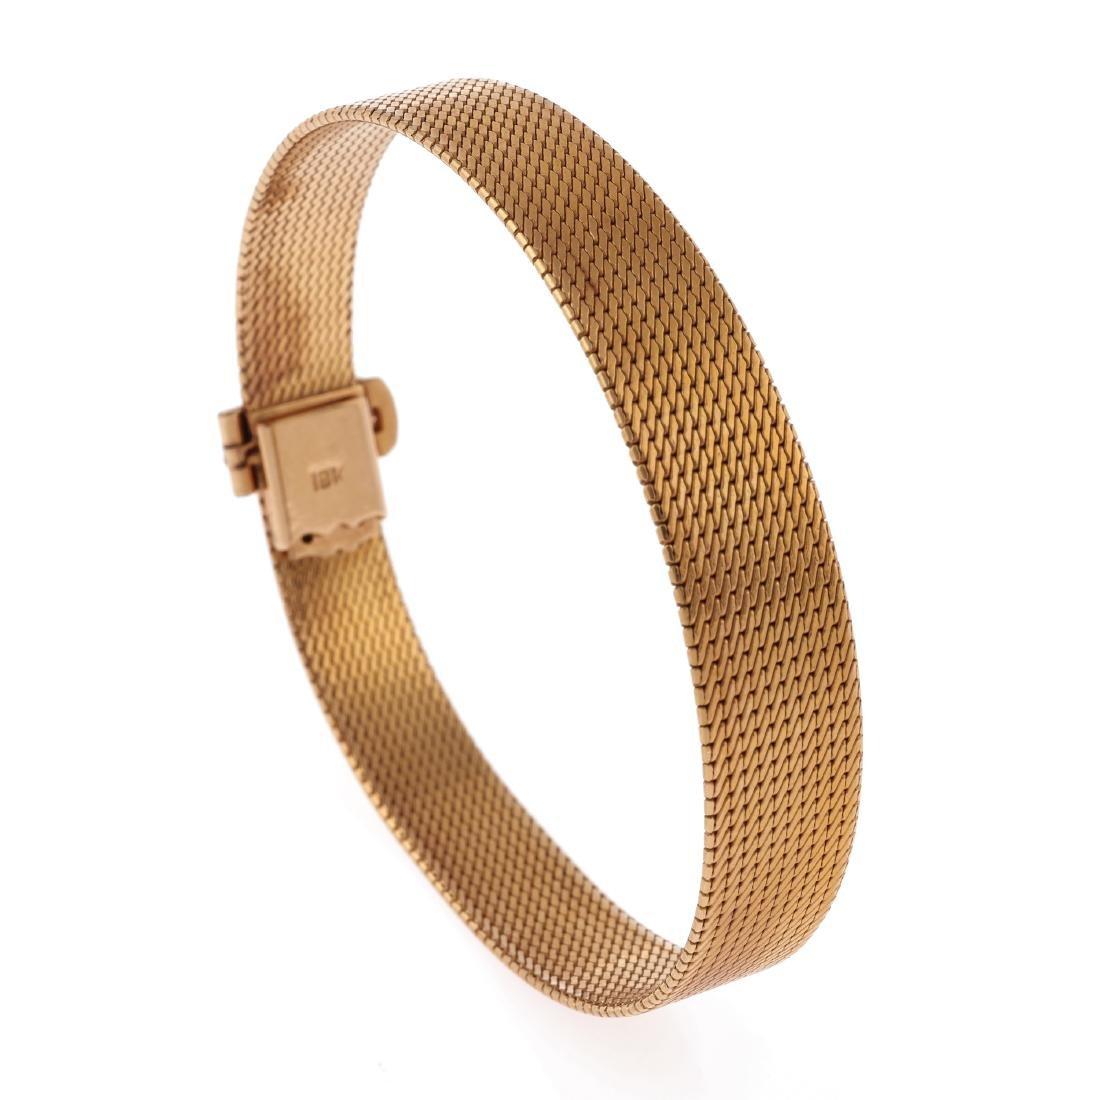 An 18k yellow gold mesh bracelet